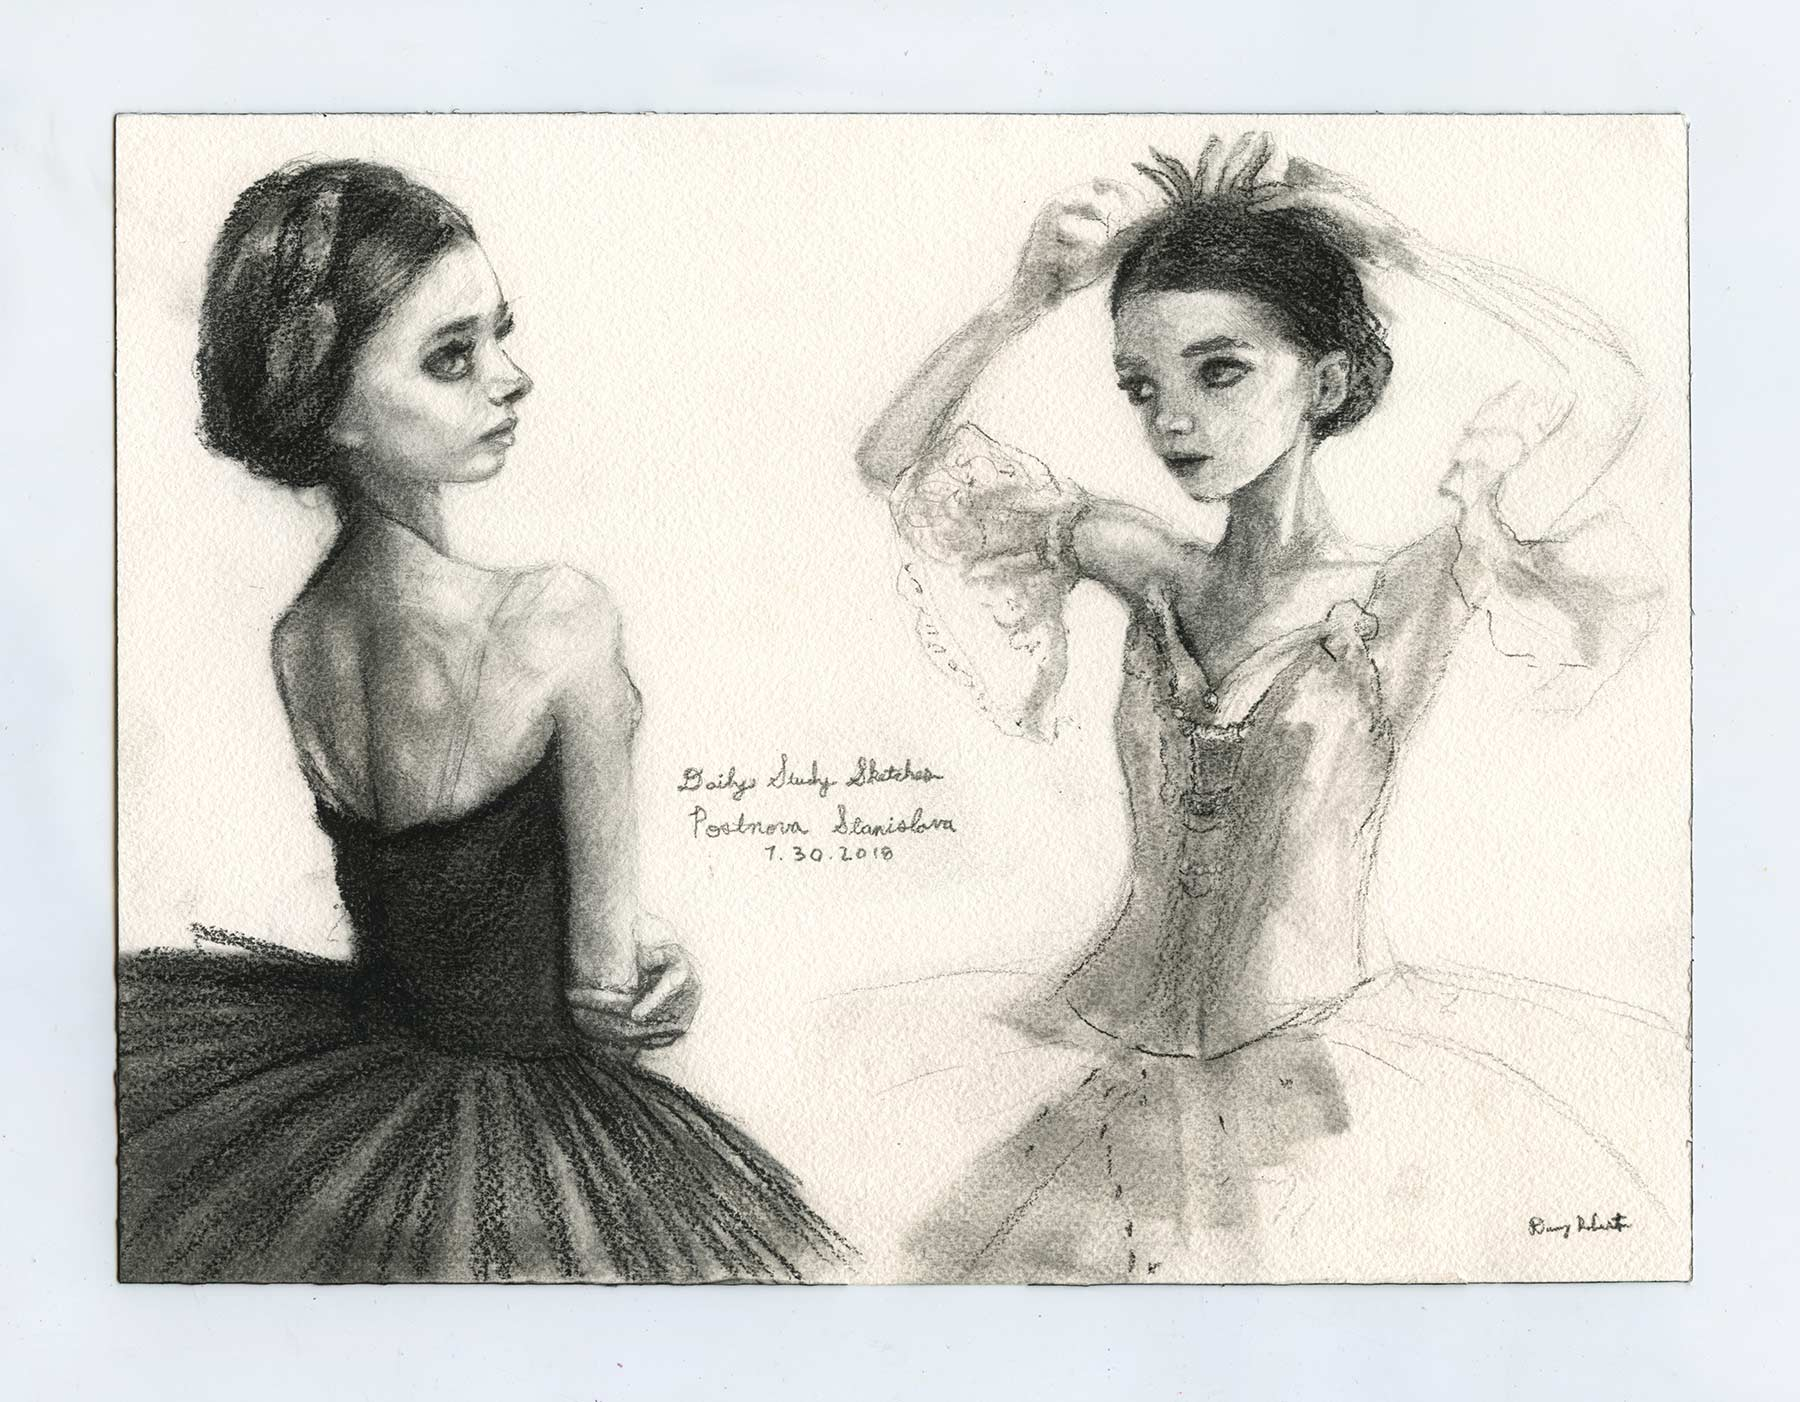 Sketch of Russian ballerina Postnova Stanislava rubytear by danny Roberts pencil and charcoal.